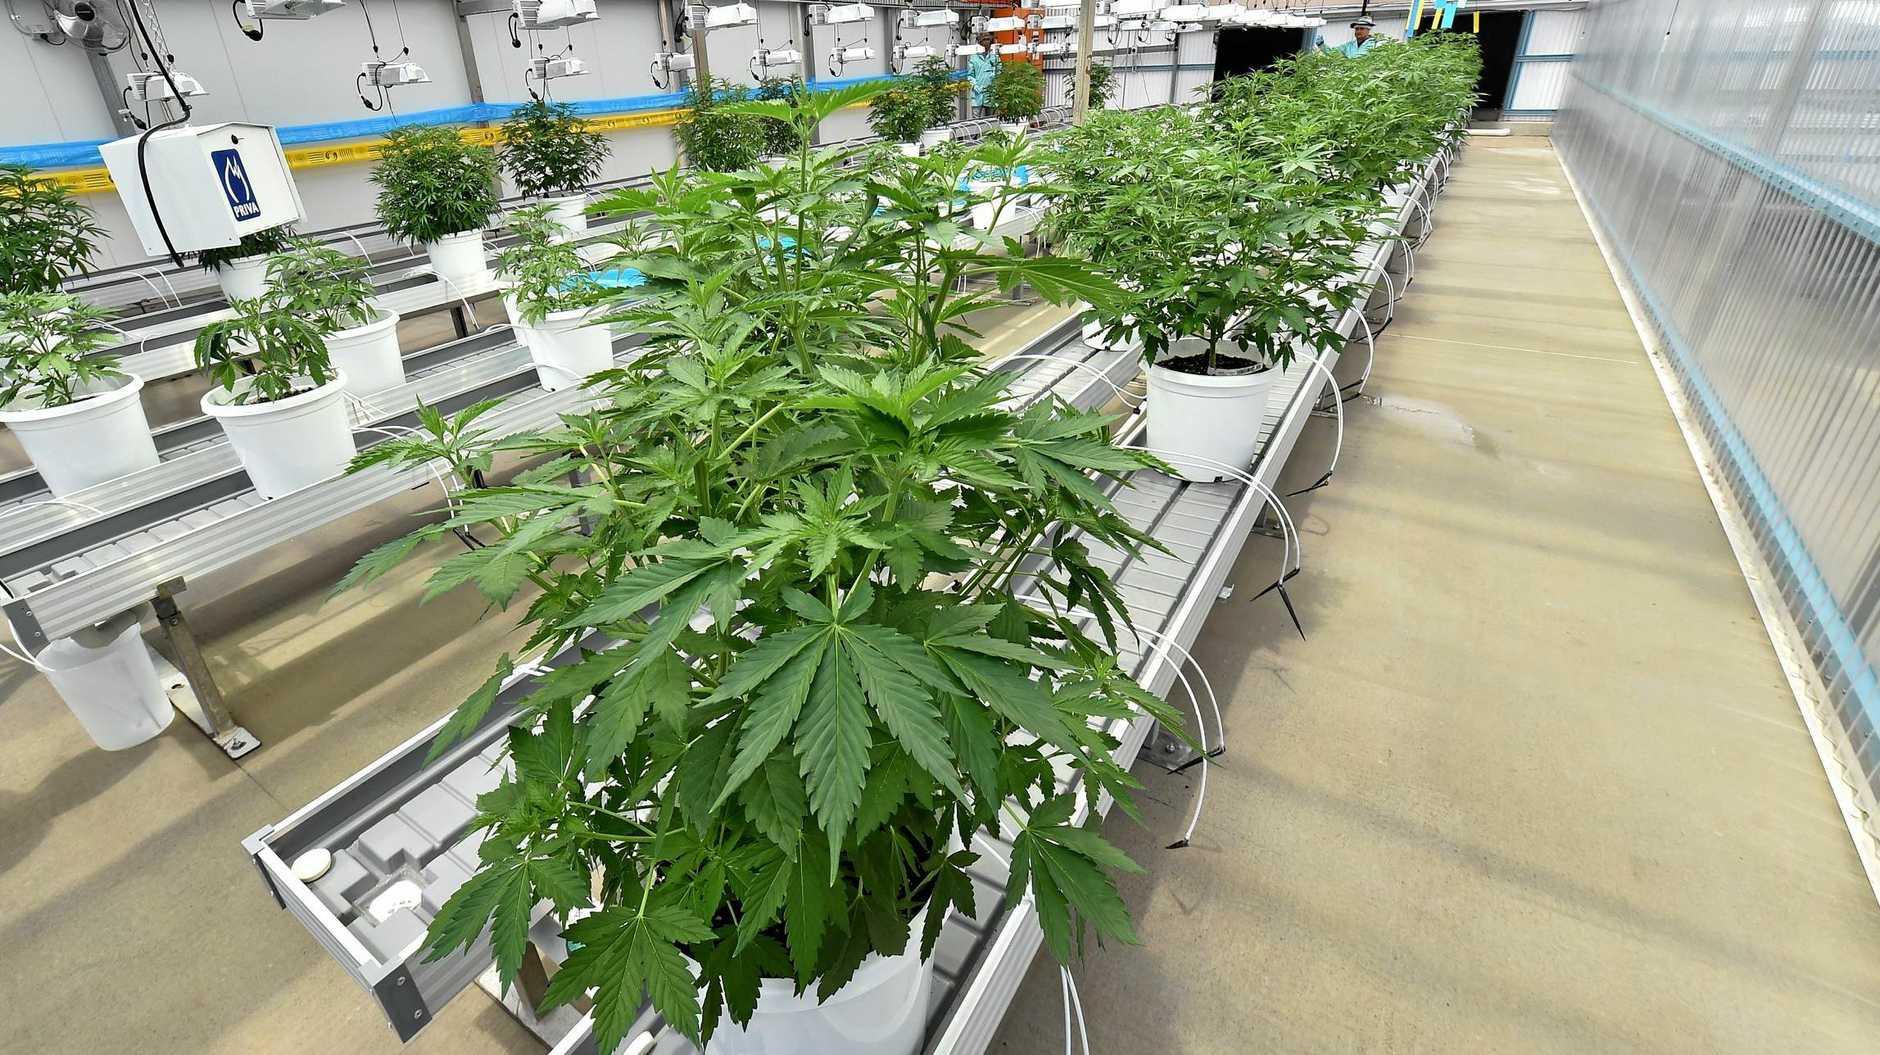 GOOD OIL: Medifarm first medicinal cannabis plants grown at the facility.